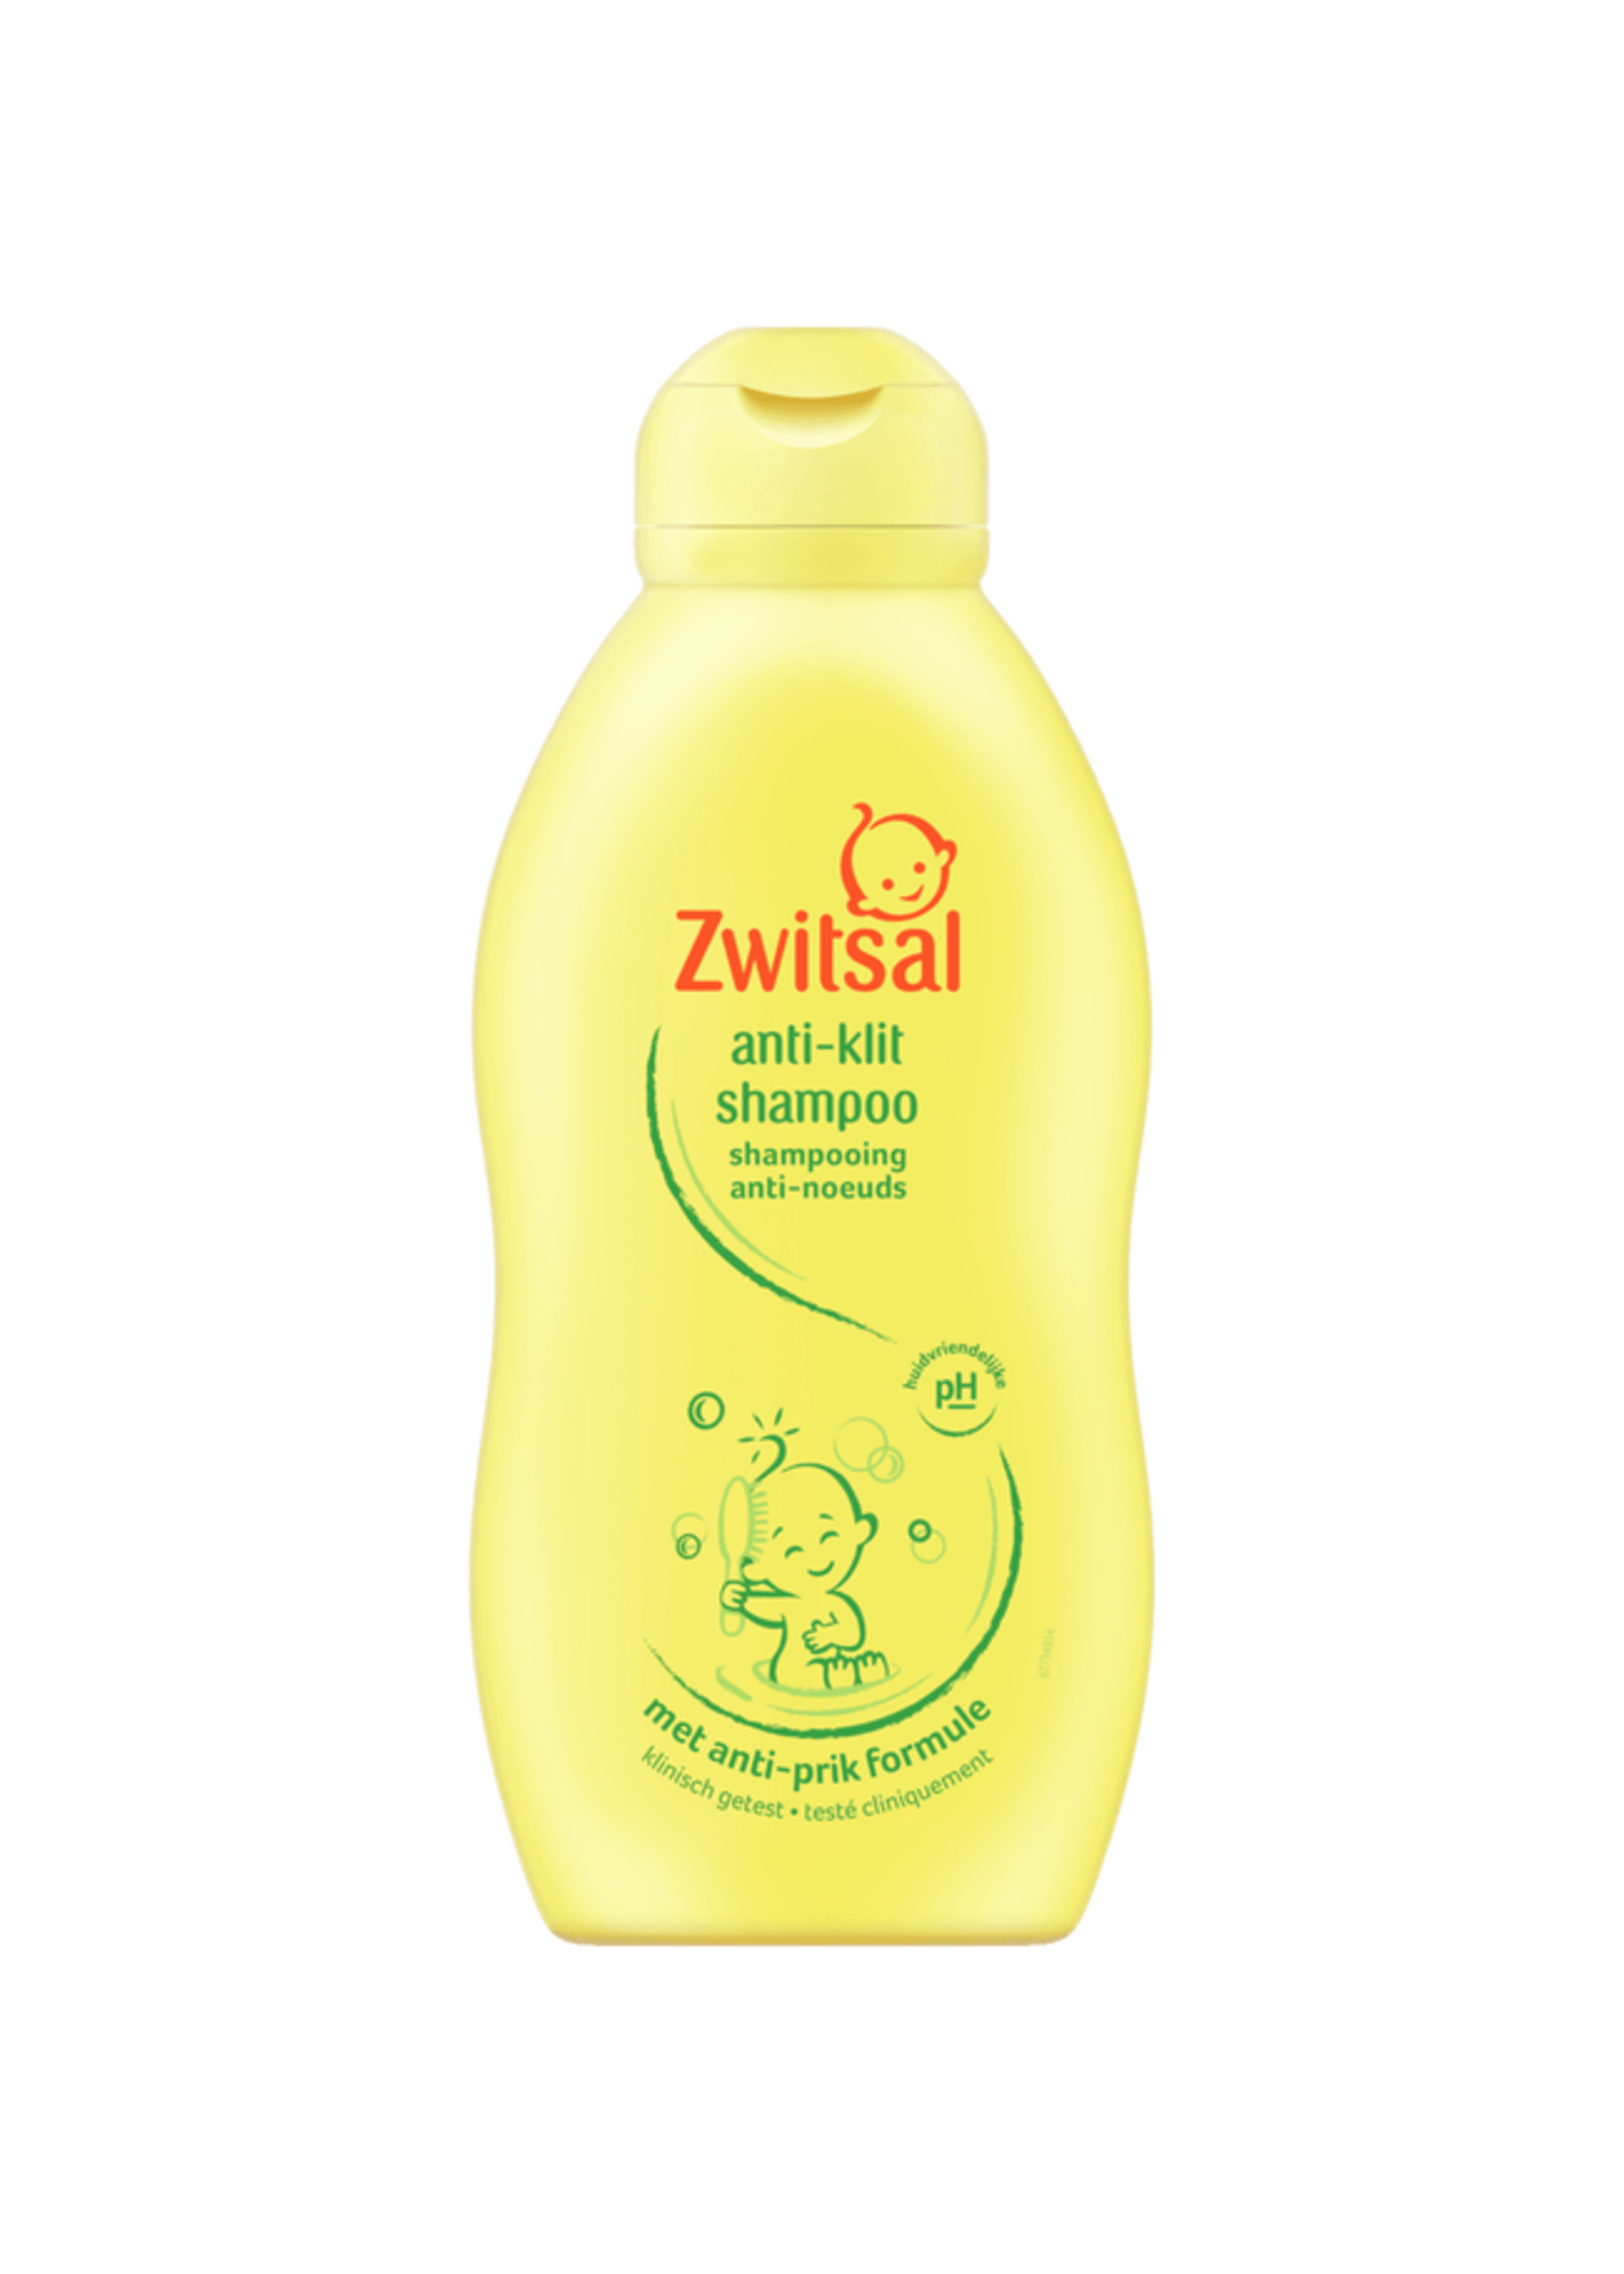 Zwitsal Anti-klit Shampoo 200ml